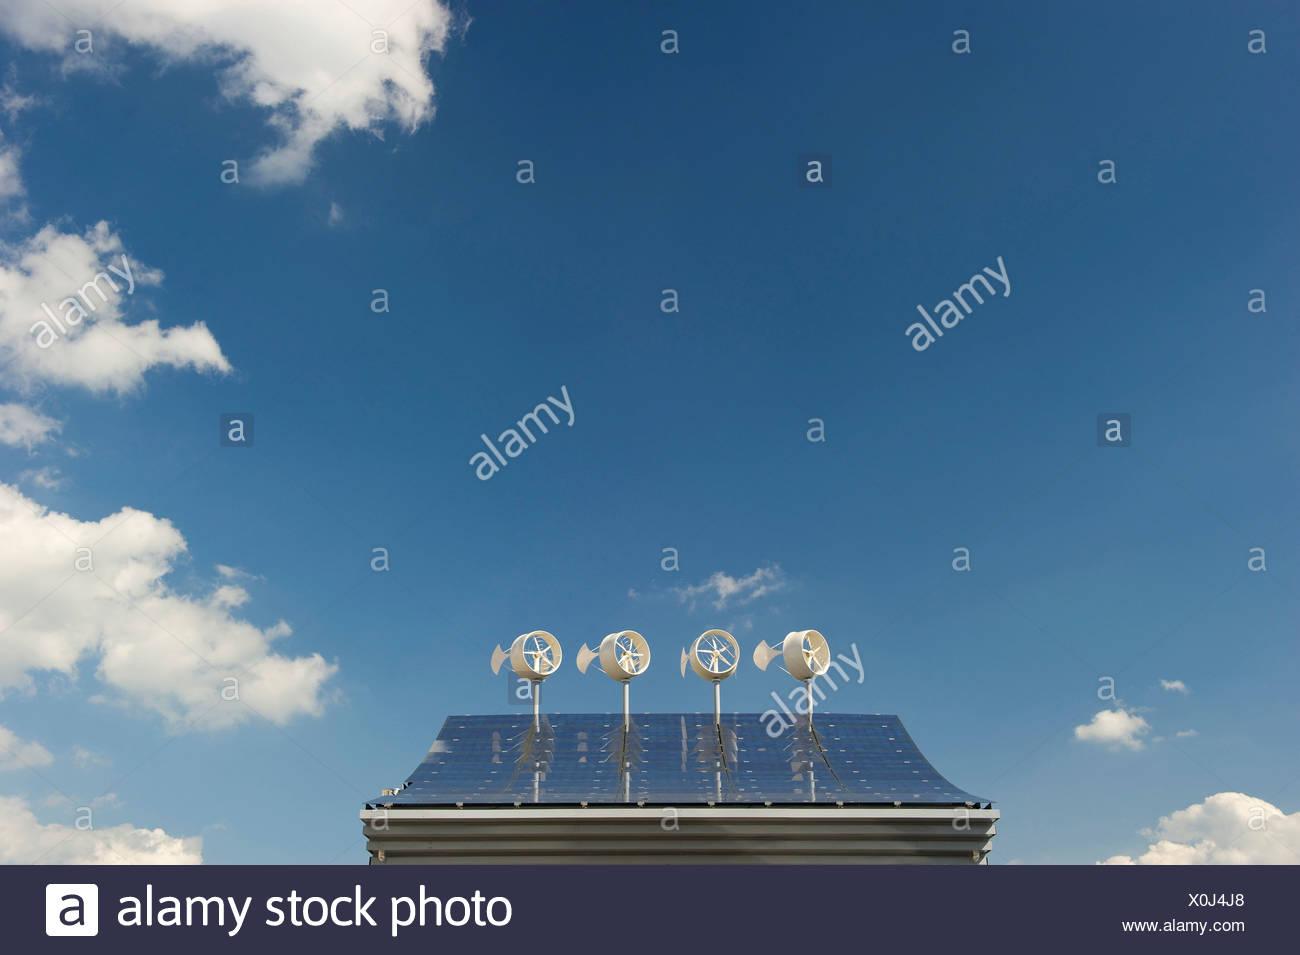 Mini Wind Turbine Stock Photos Amp Mini Wind Turbine Stock